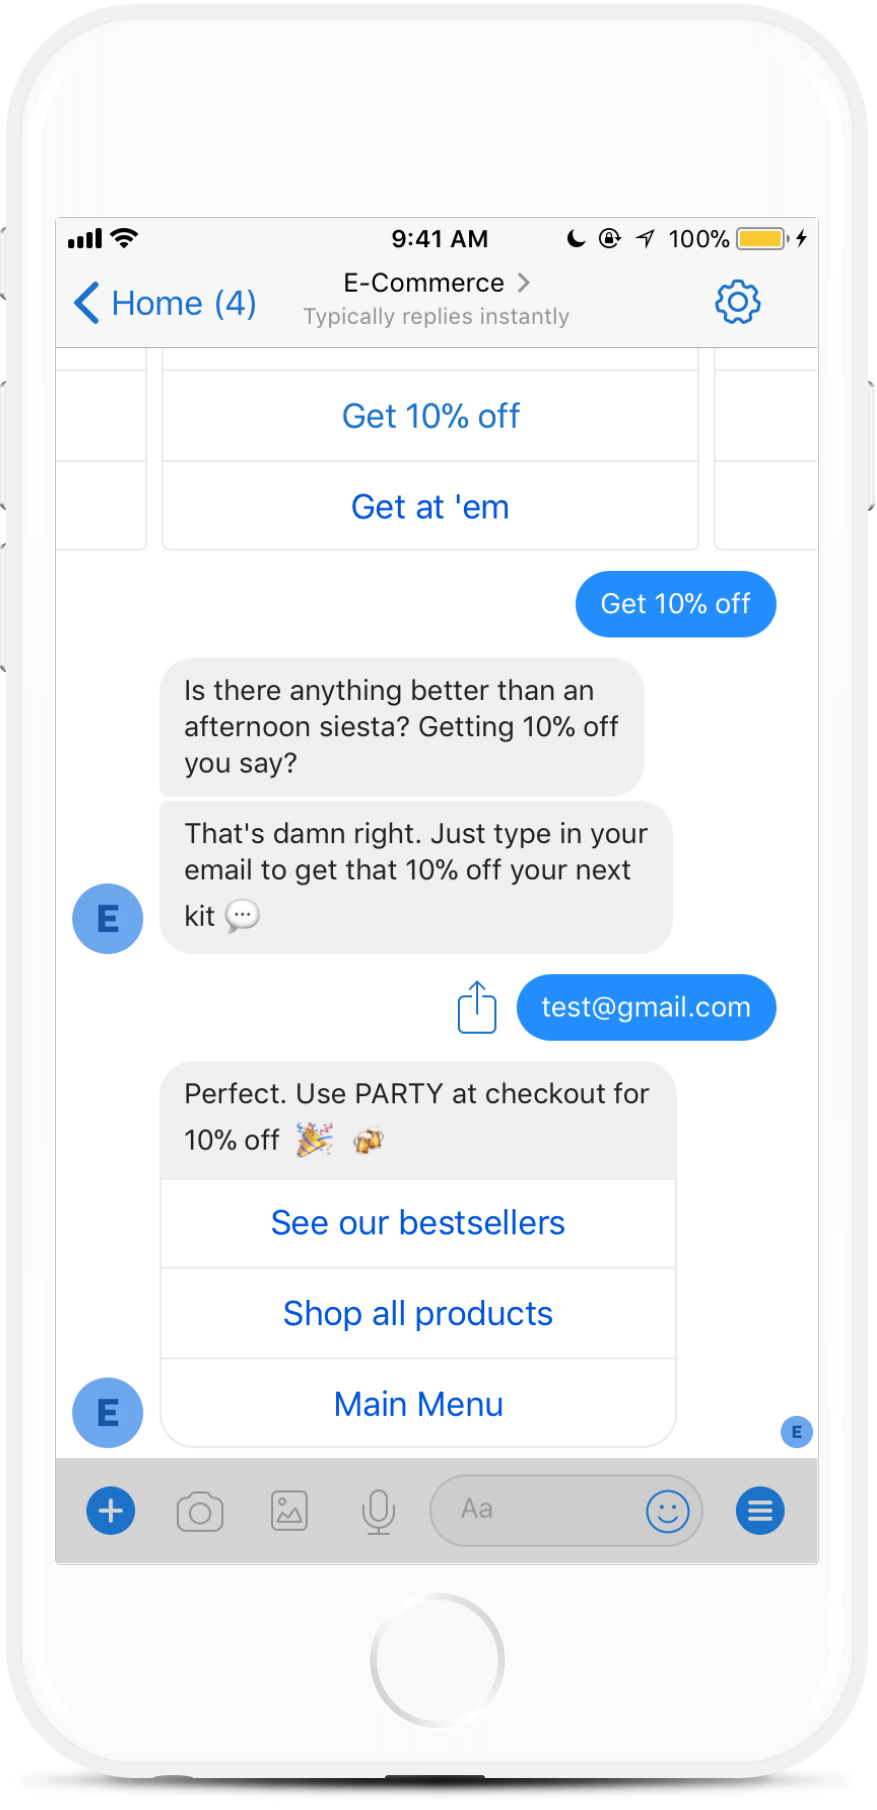 E-Commerce Bot Template for Online Brands for $229   #messenger #bottemplates #bots #chatbots #aibots #fbmessenger #botmakers